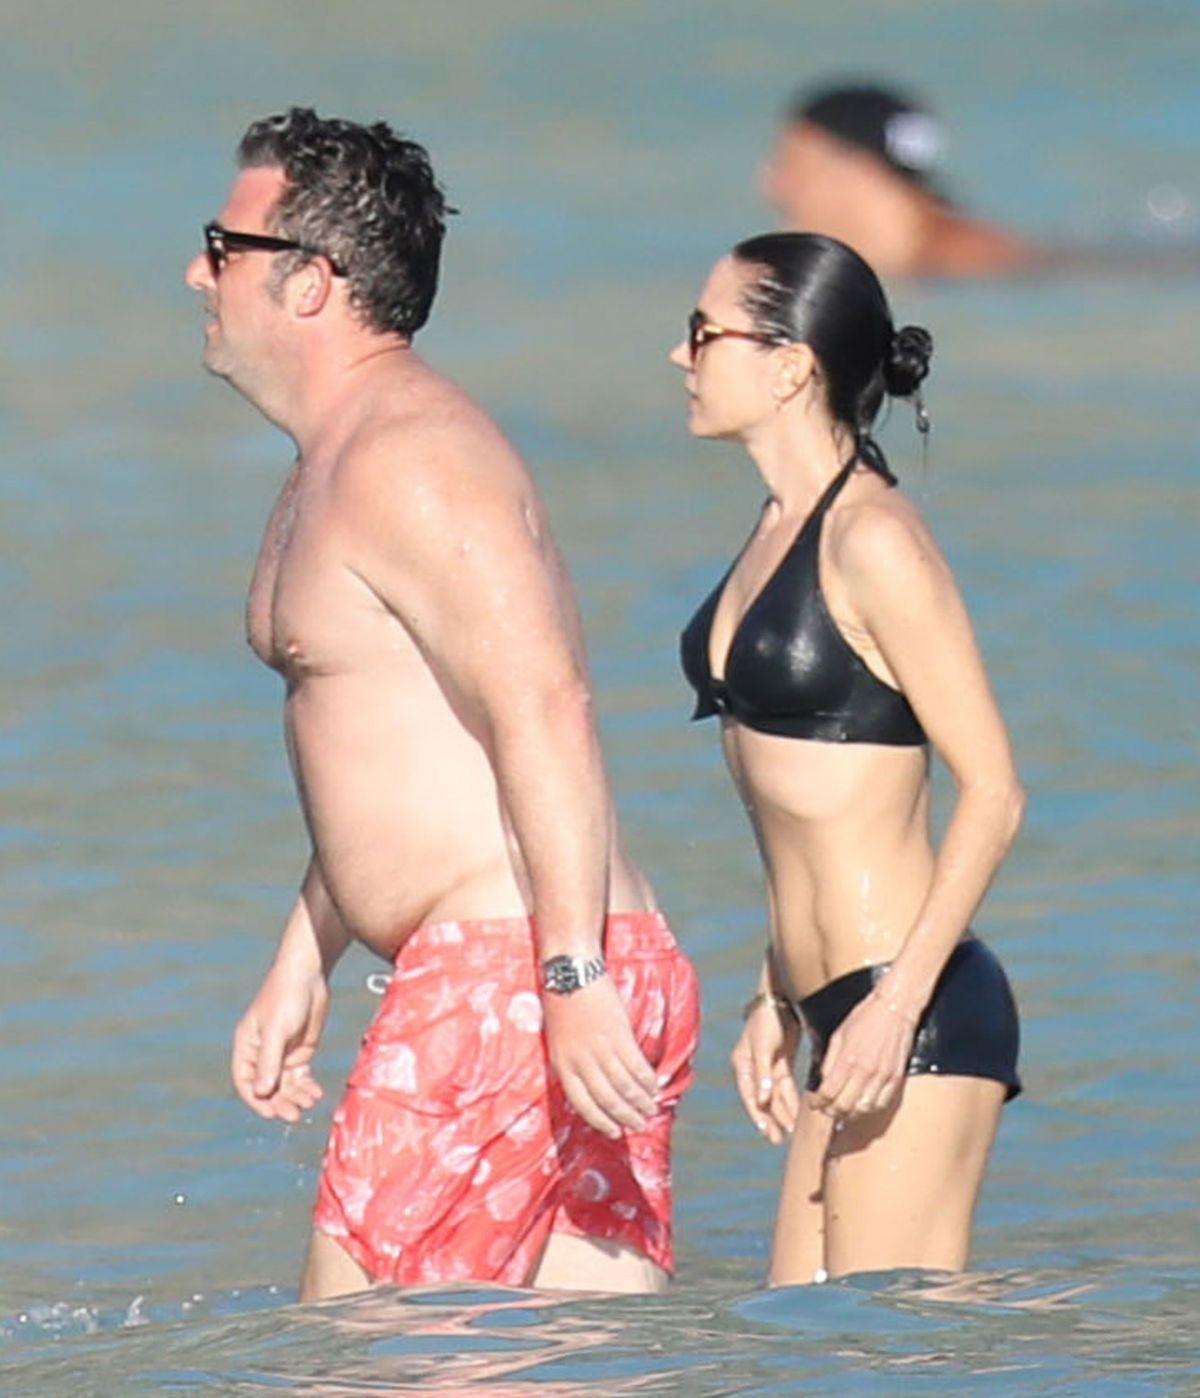 A Connelly Jennifer Beach In StBarts At 02172017 Bikini uF5T1J3lKc